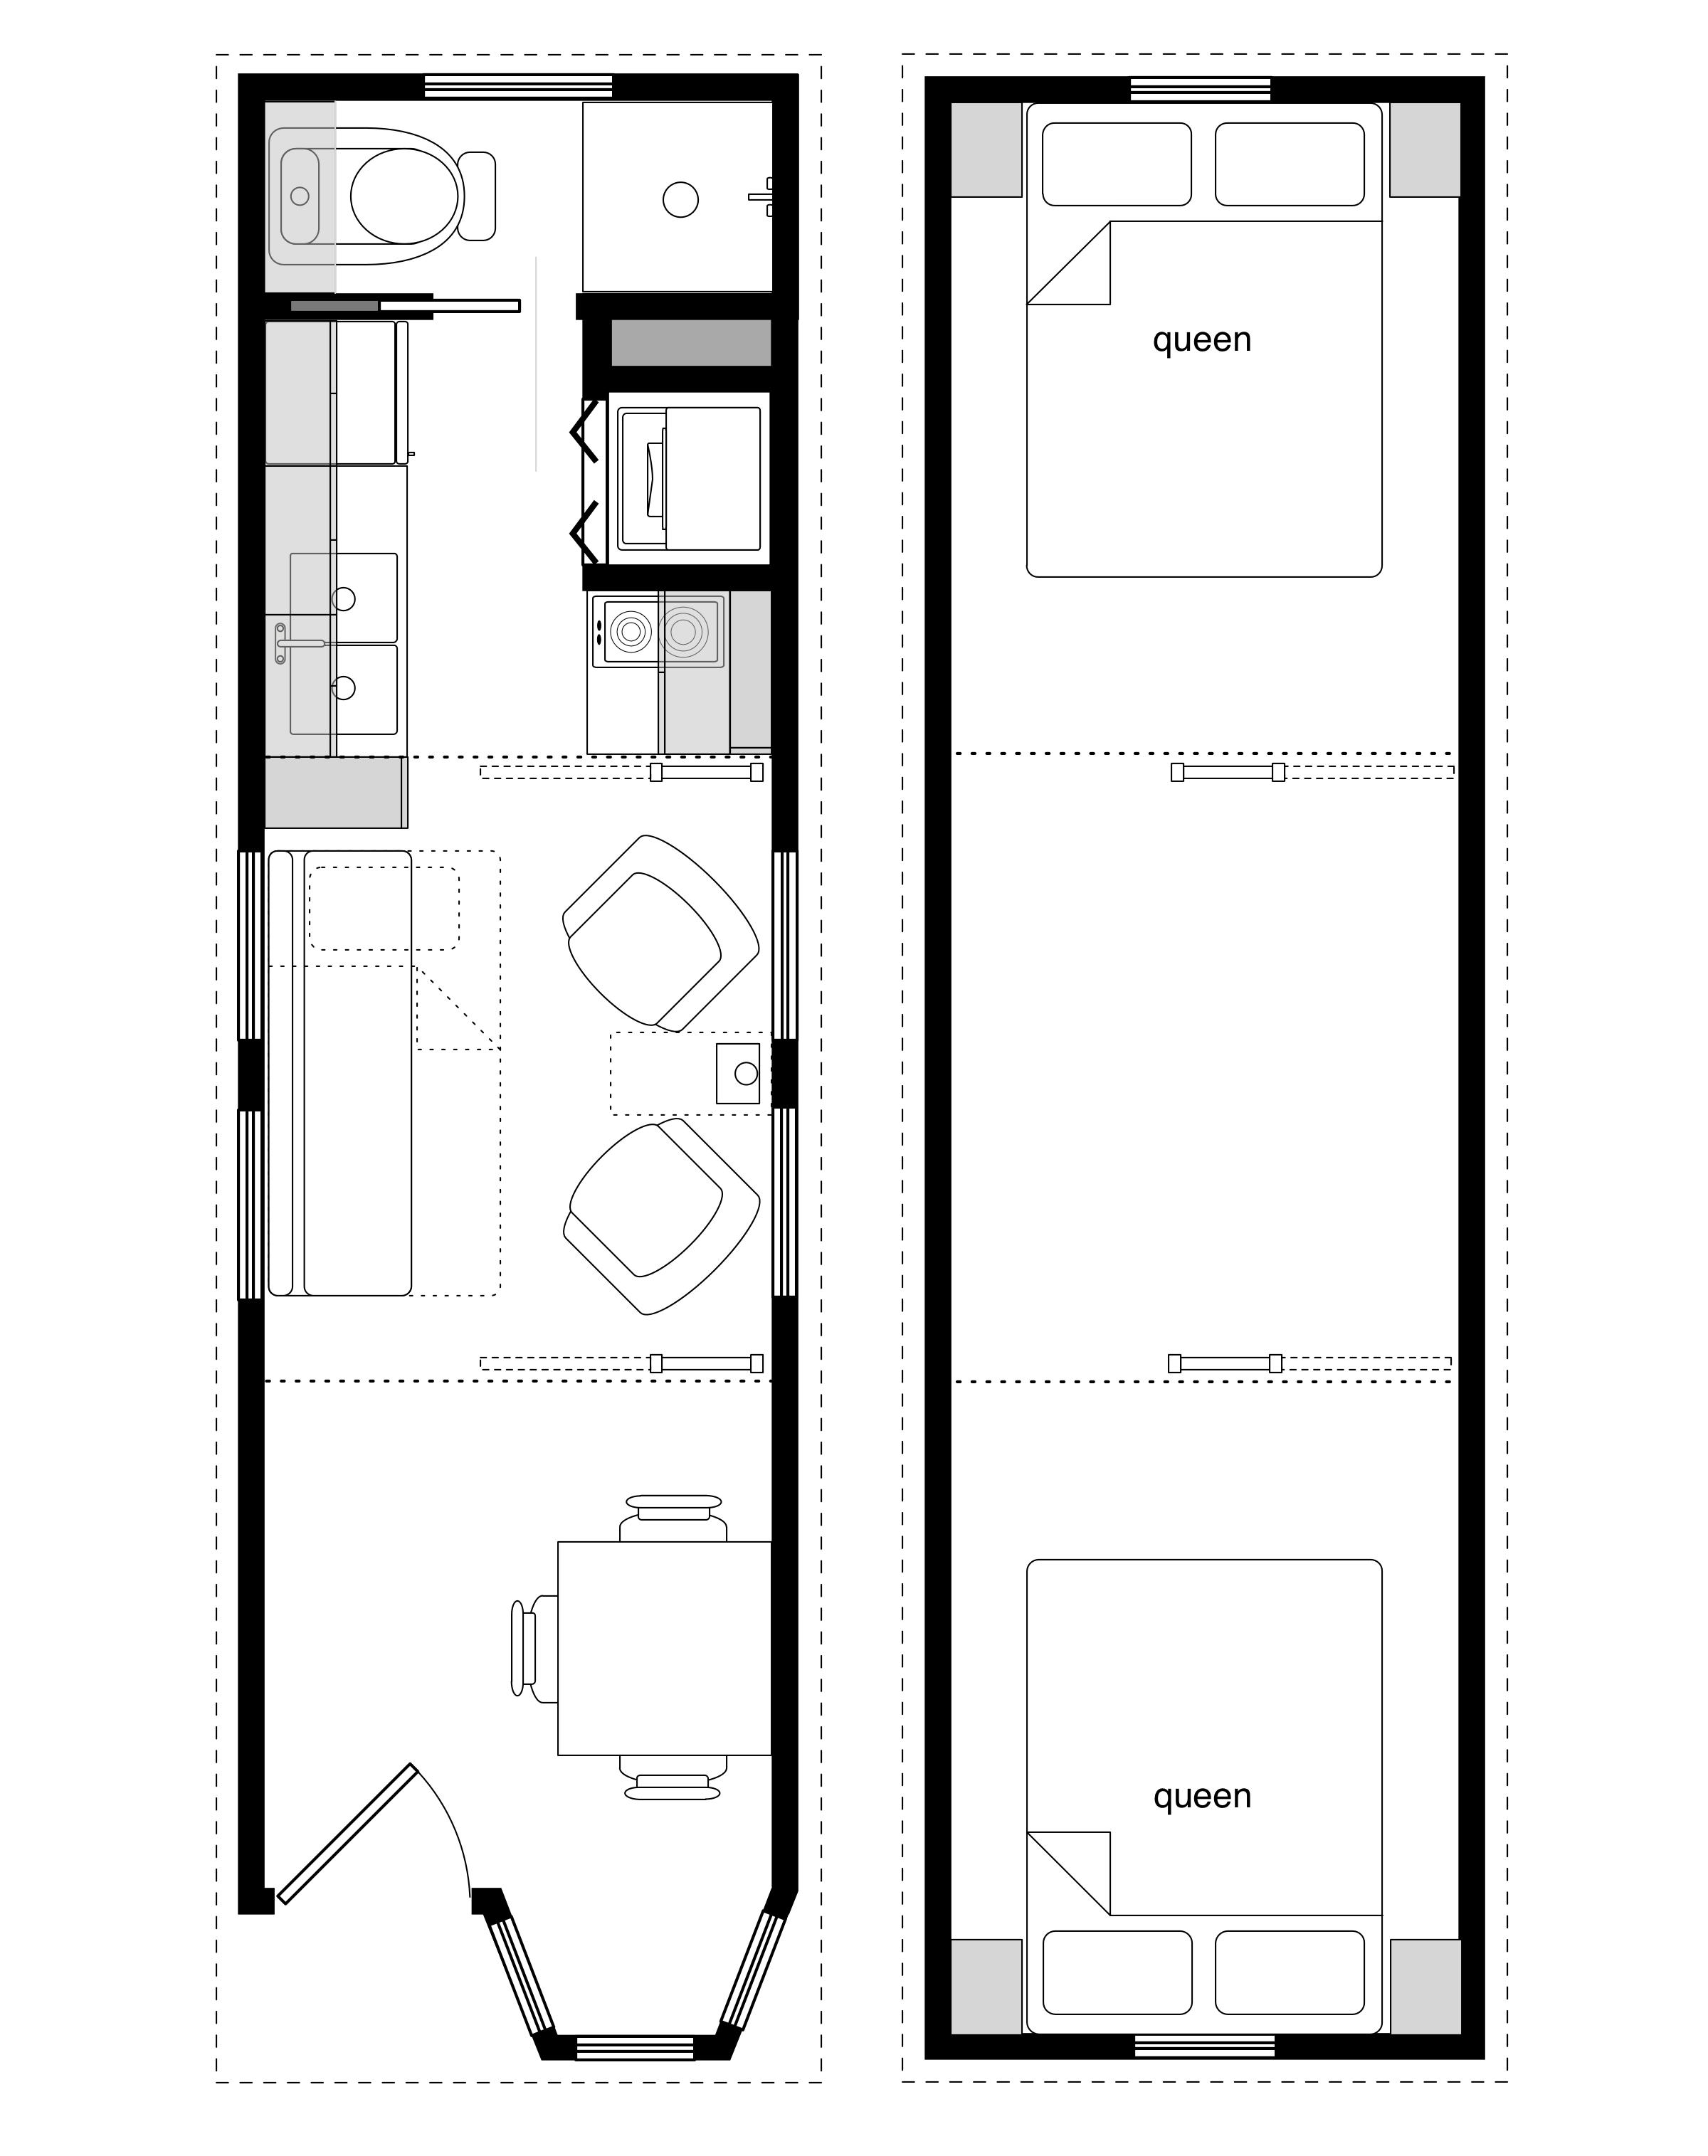 Sample Floor Plans For The 8 28 Coastal Cottage